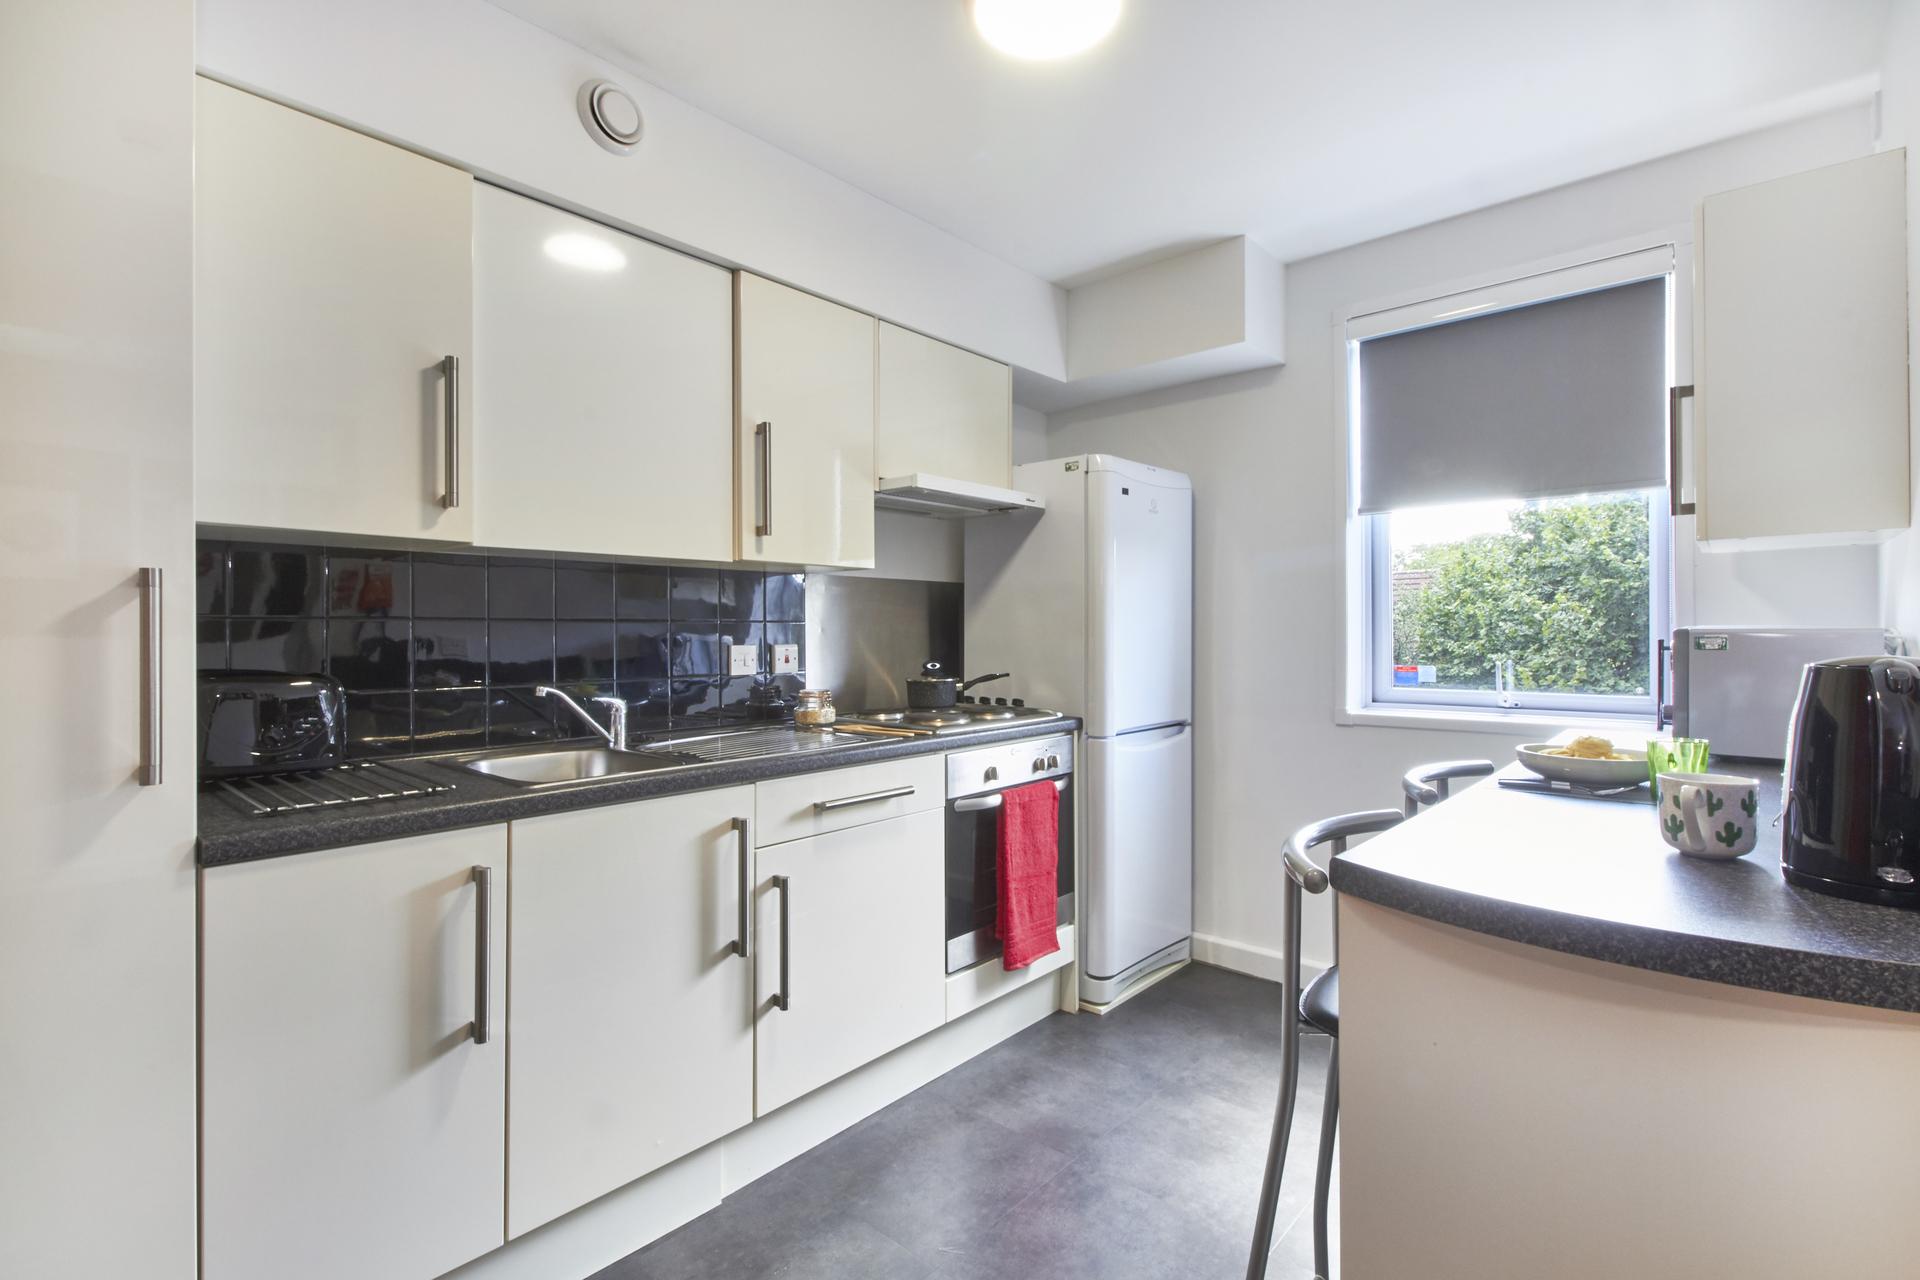 kitchenette in slade park oxford